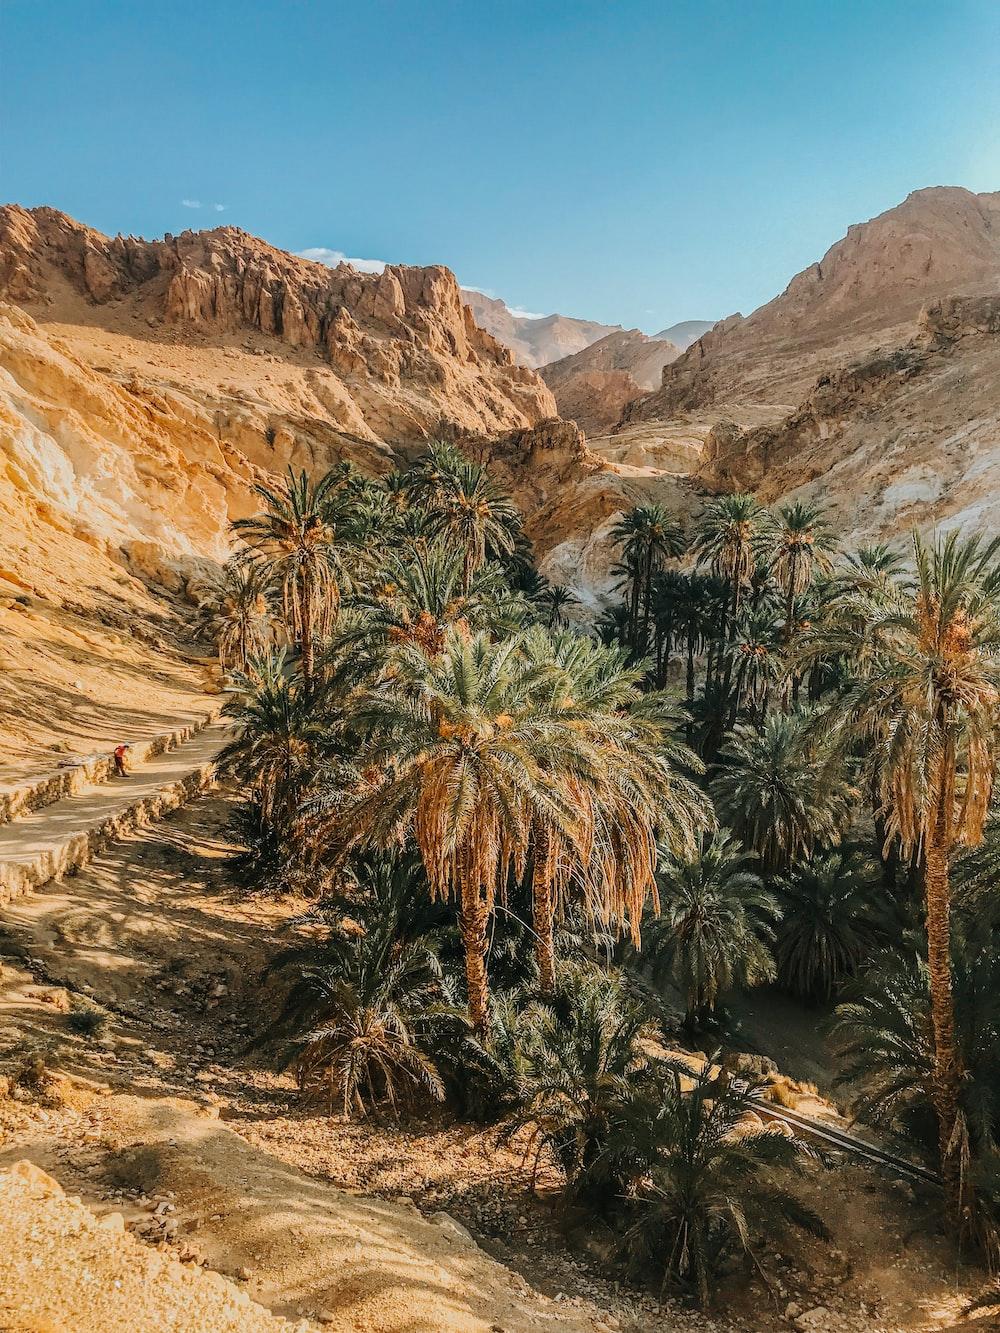 green palm tree near brown mountain during daytime